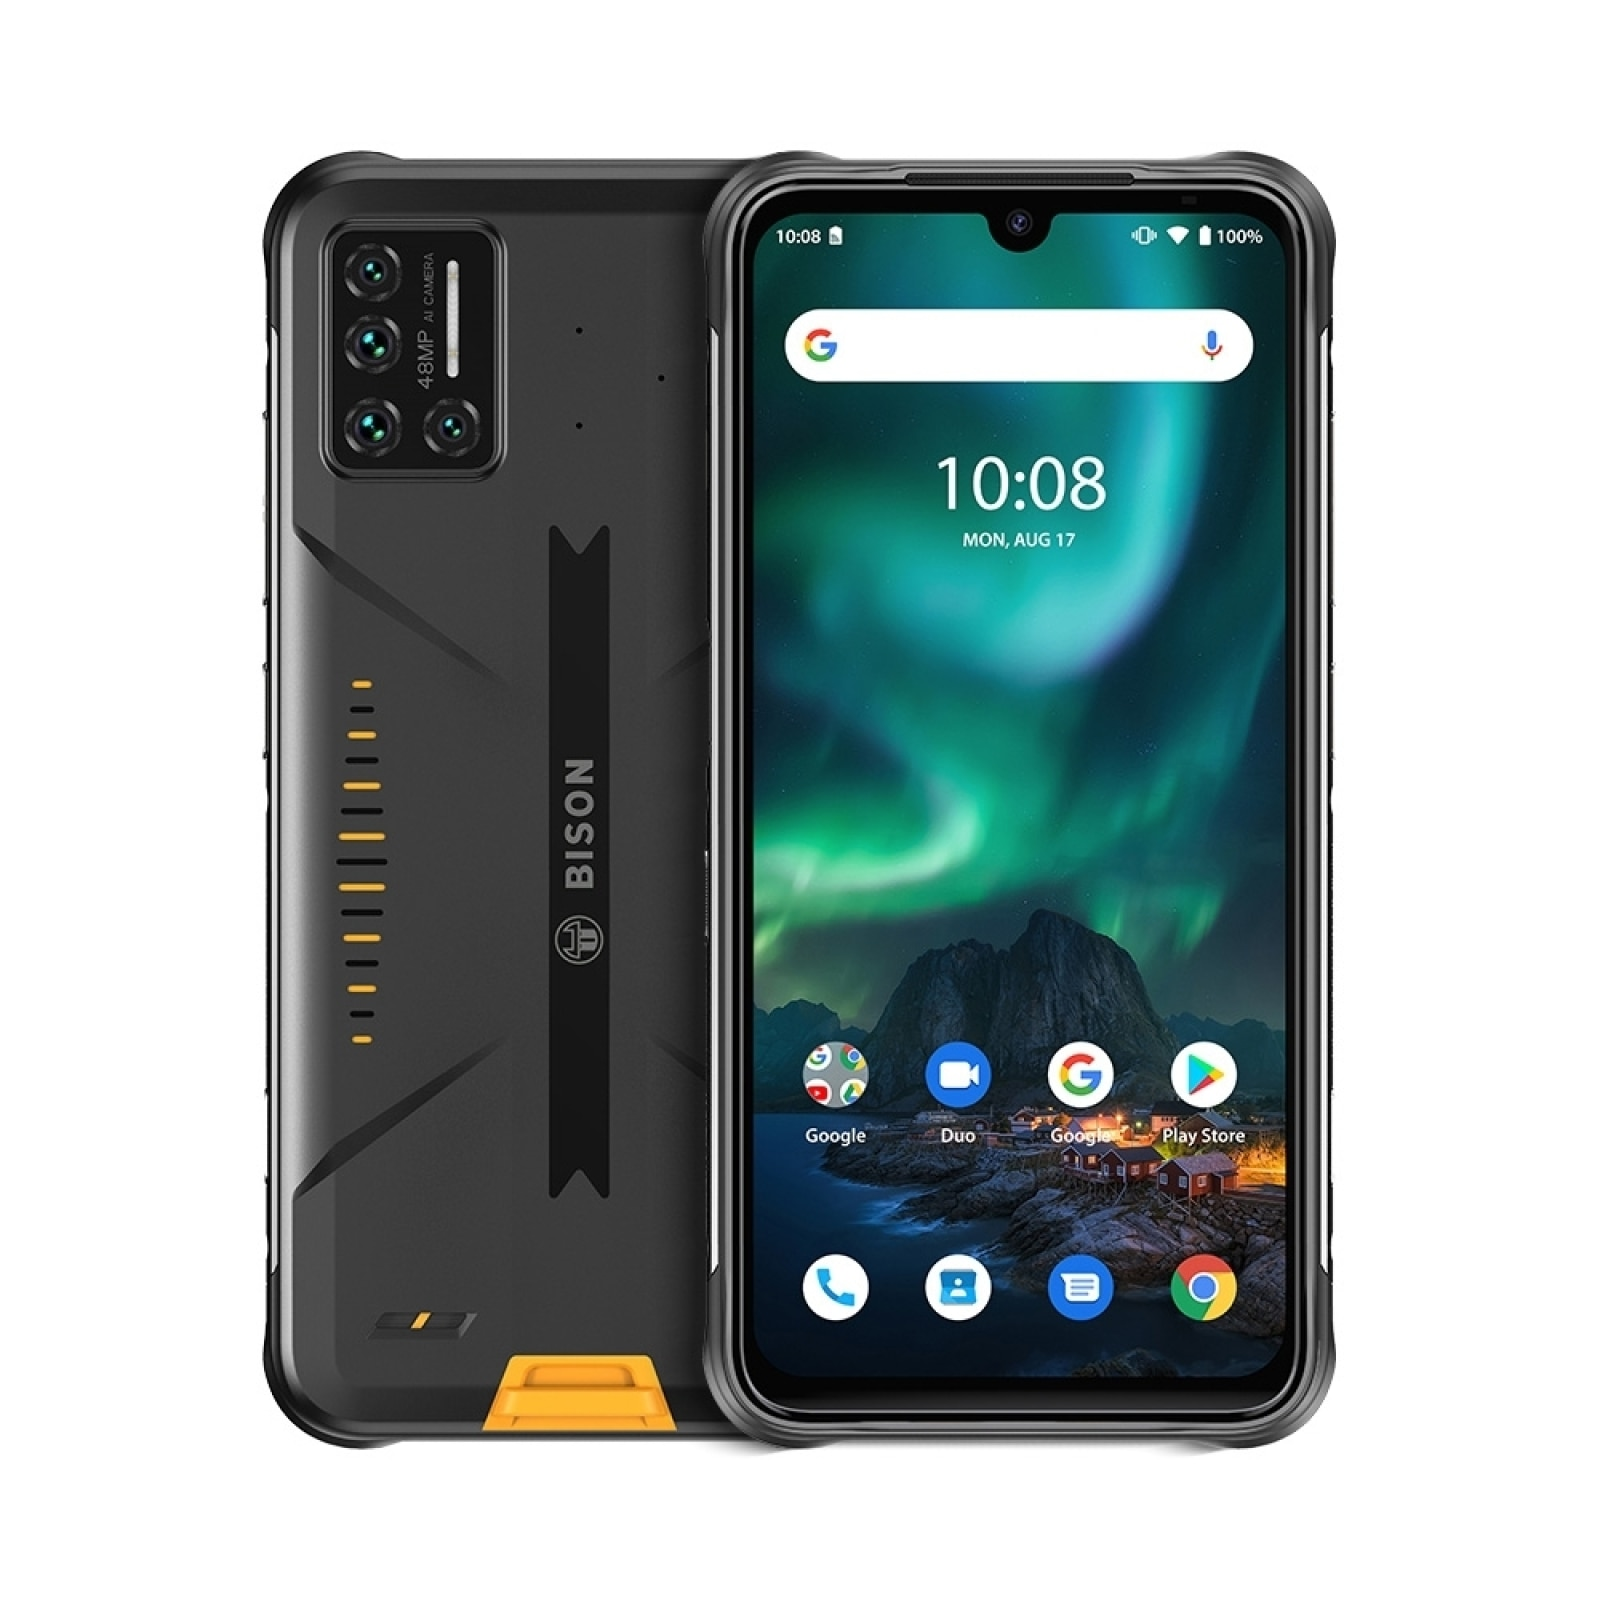 UMIDIGI BISON 8GB+128GB IP68/IP69K Waterproof Rugged Phone 48MP Matrix Quad Camera 6.3